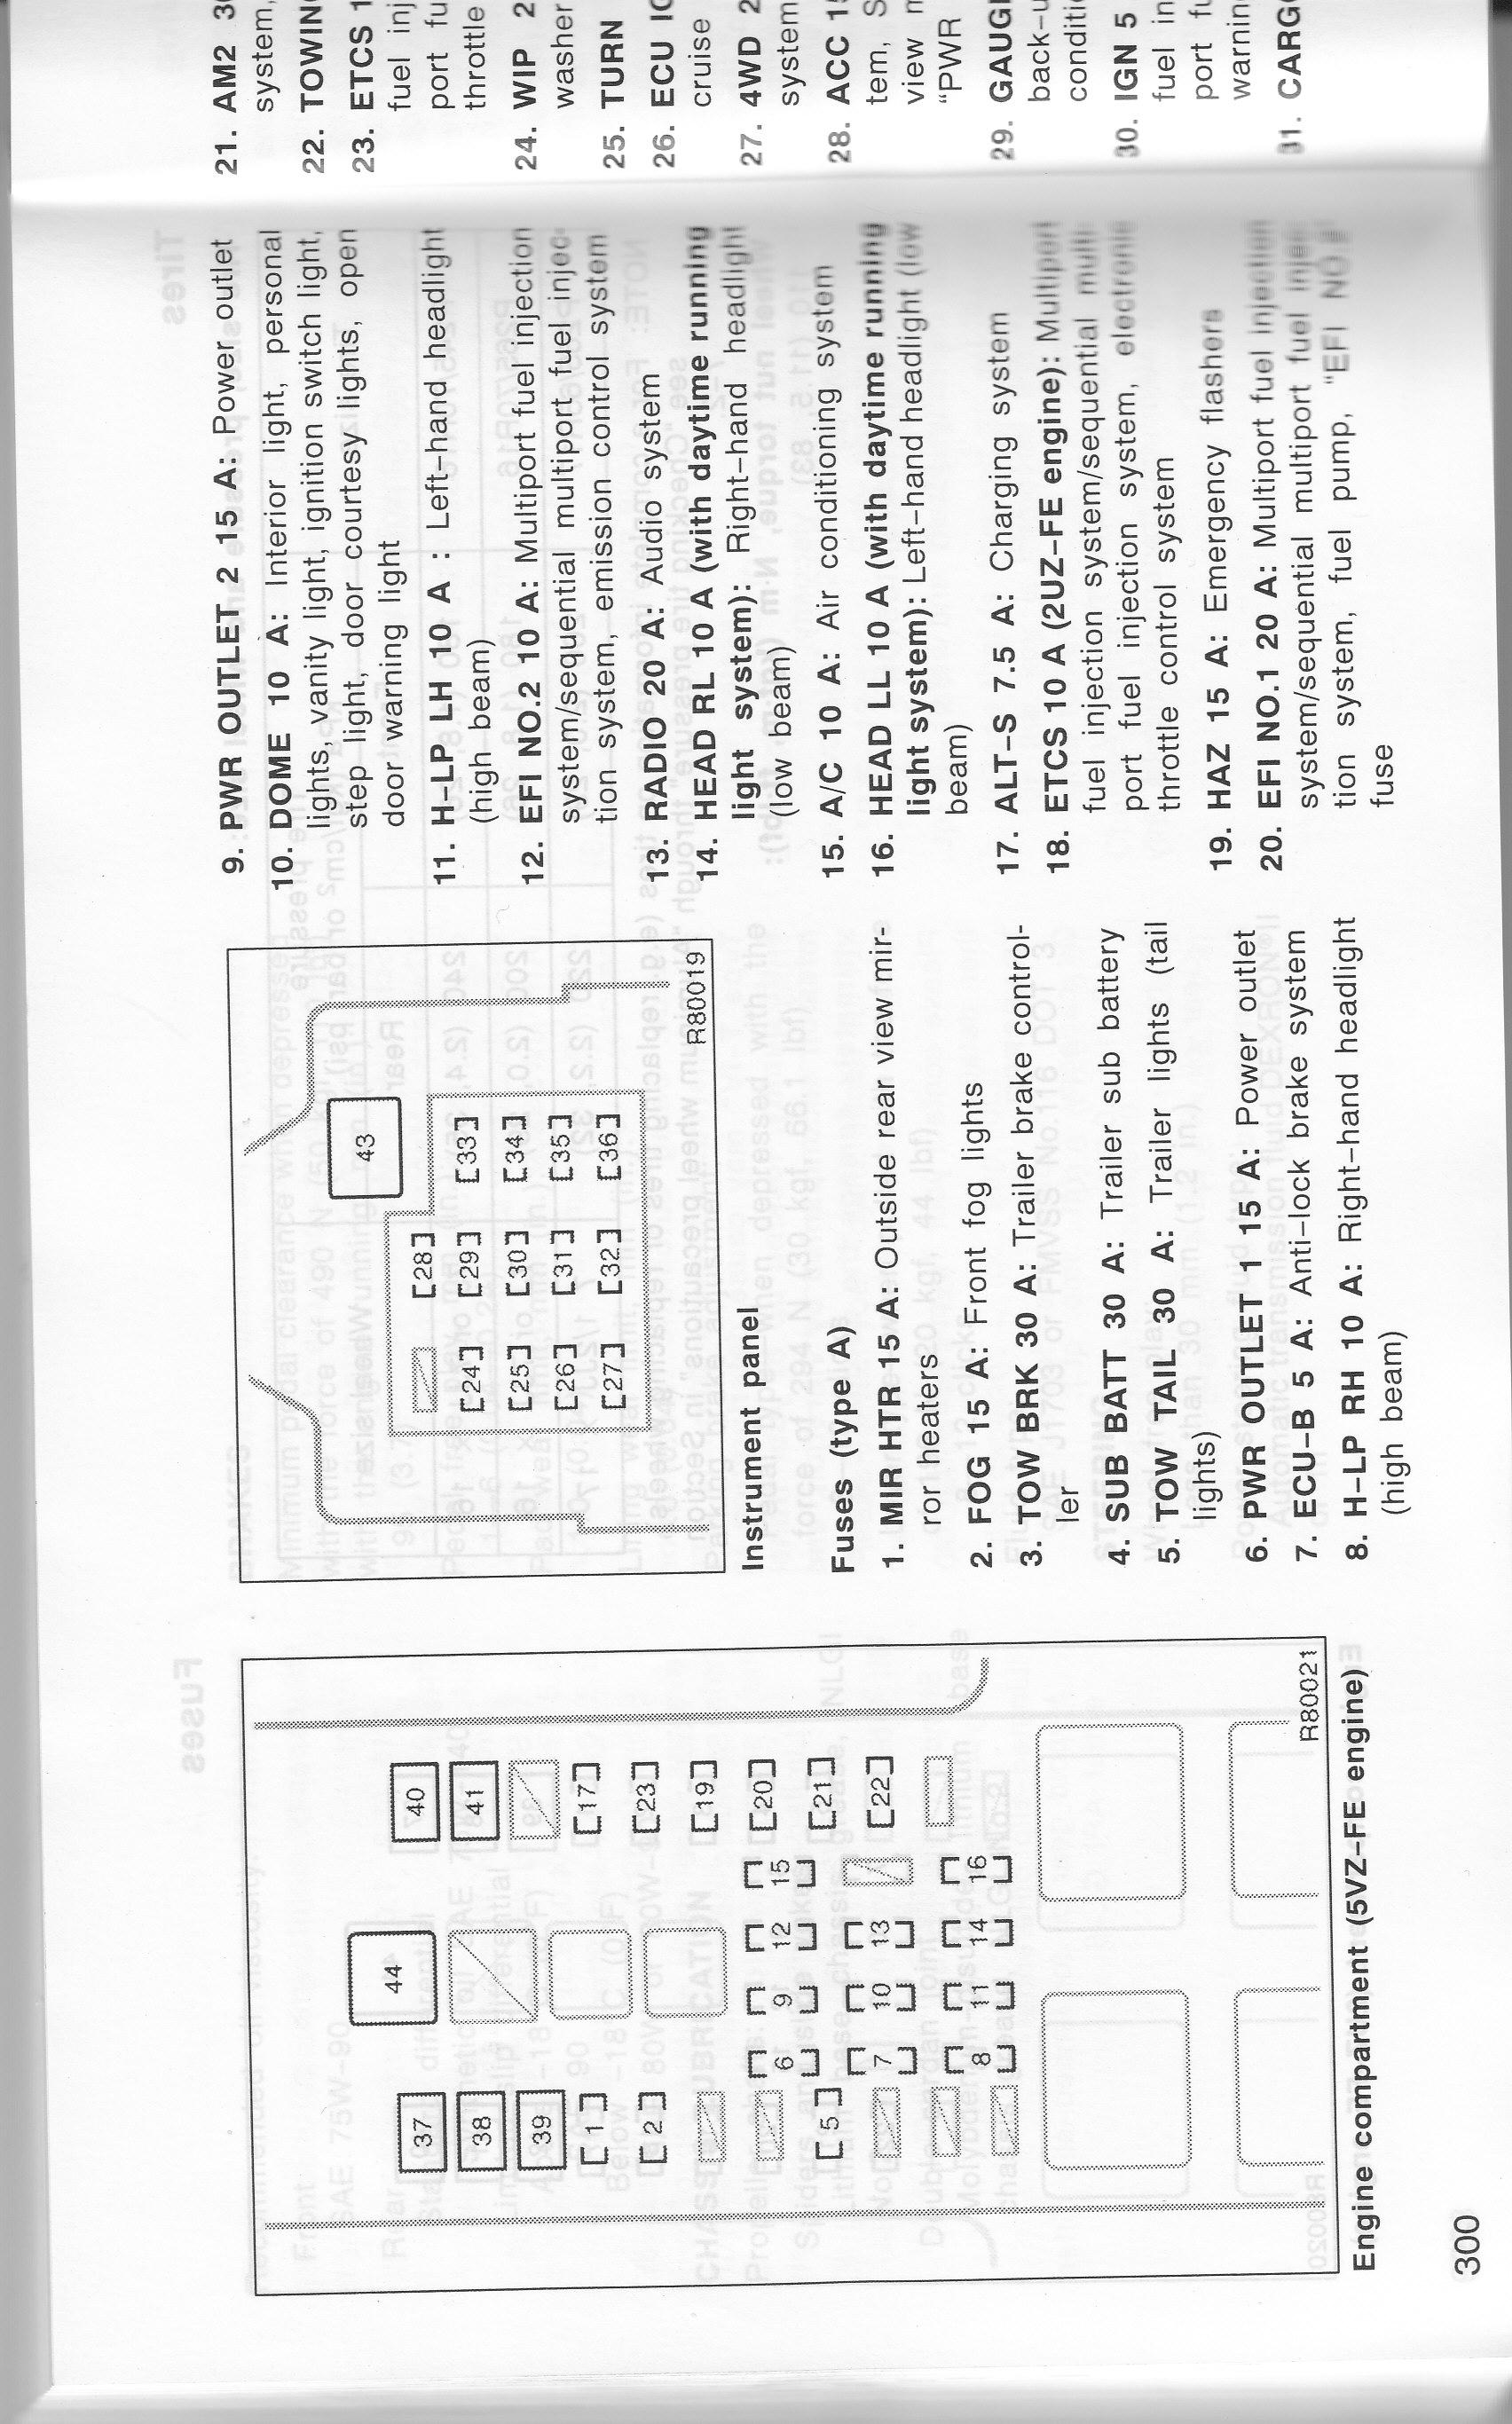 2005 tundra trailer wiring diagram gk 1201  toyota tundra stereo wiring diagram view diagram  toyota tundra stereo wiring diagram